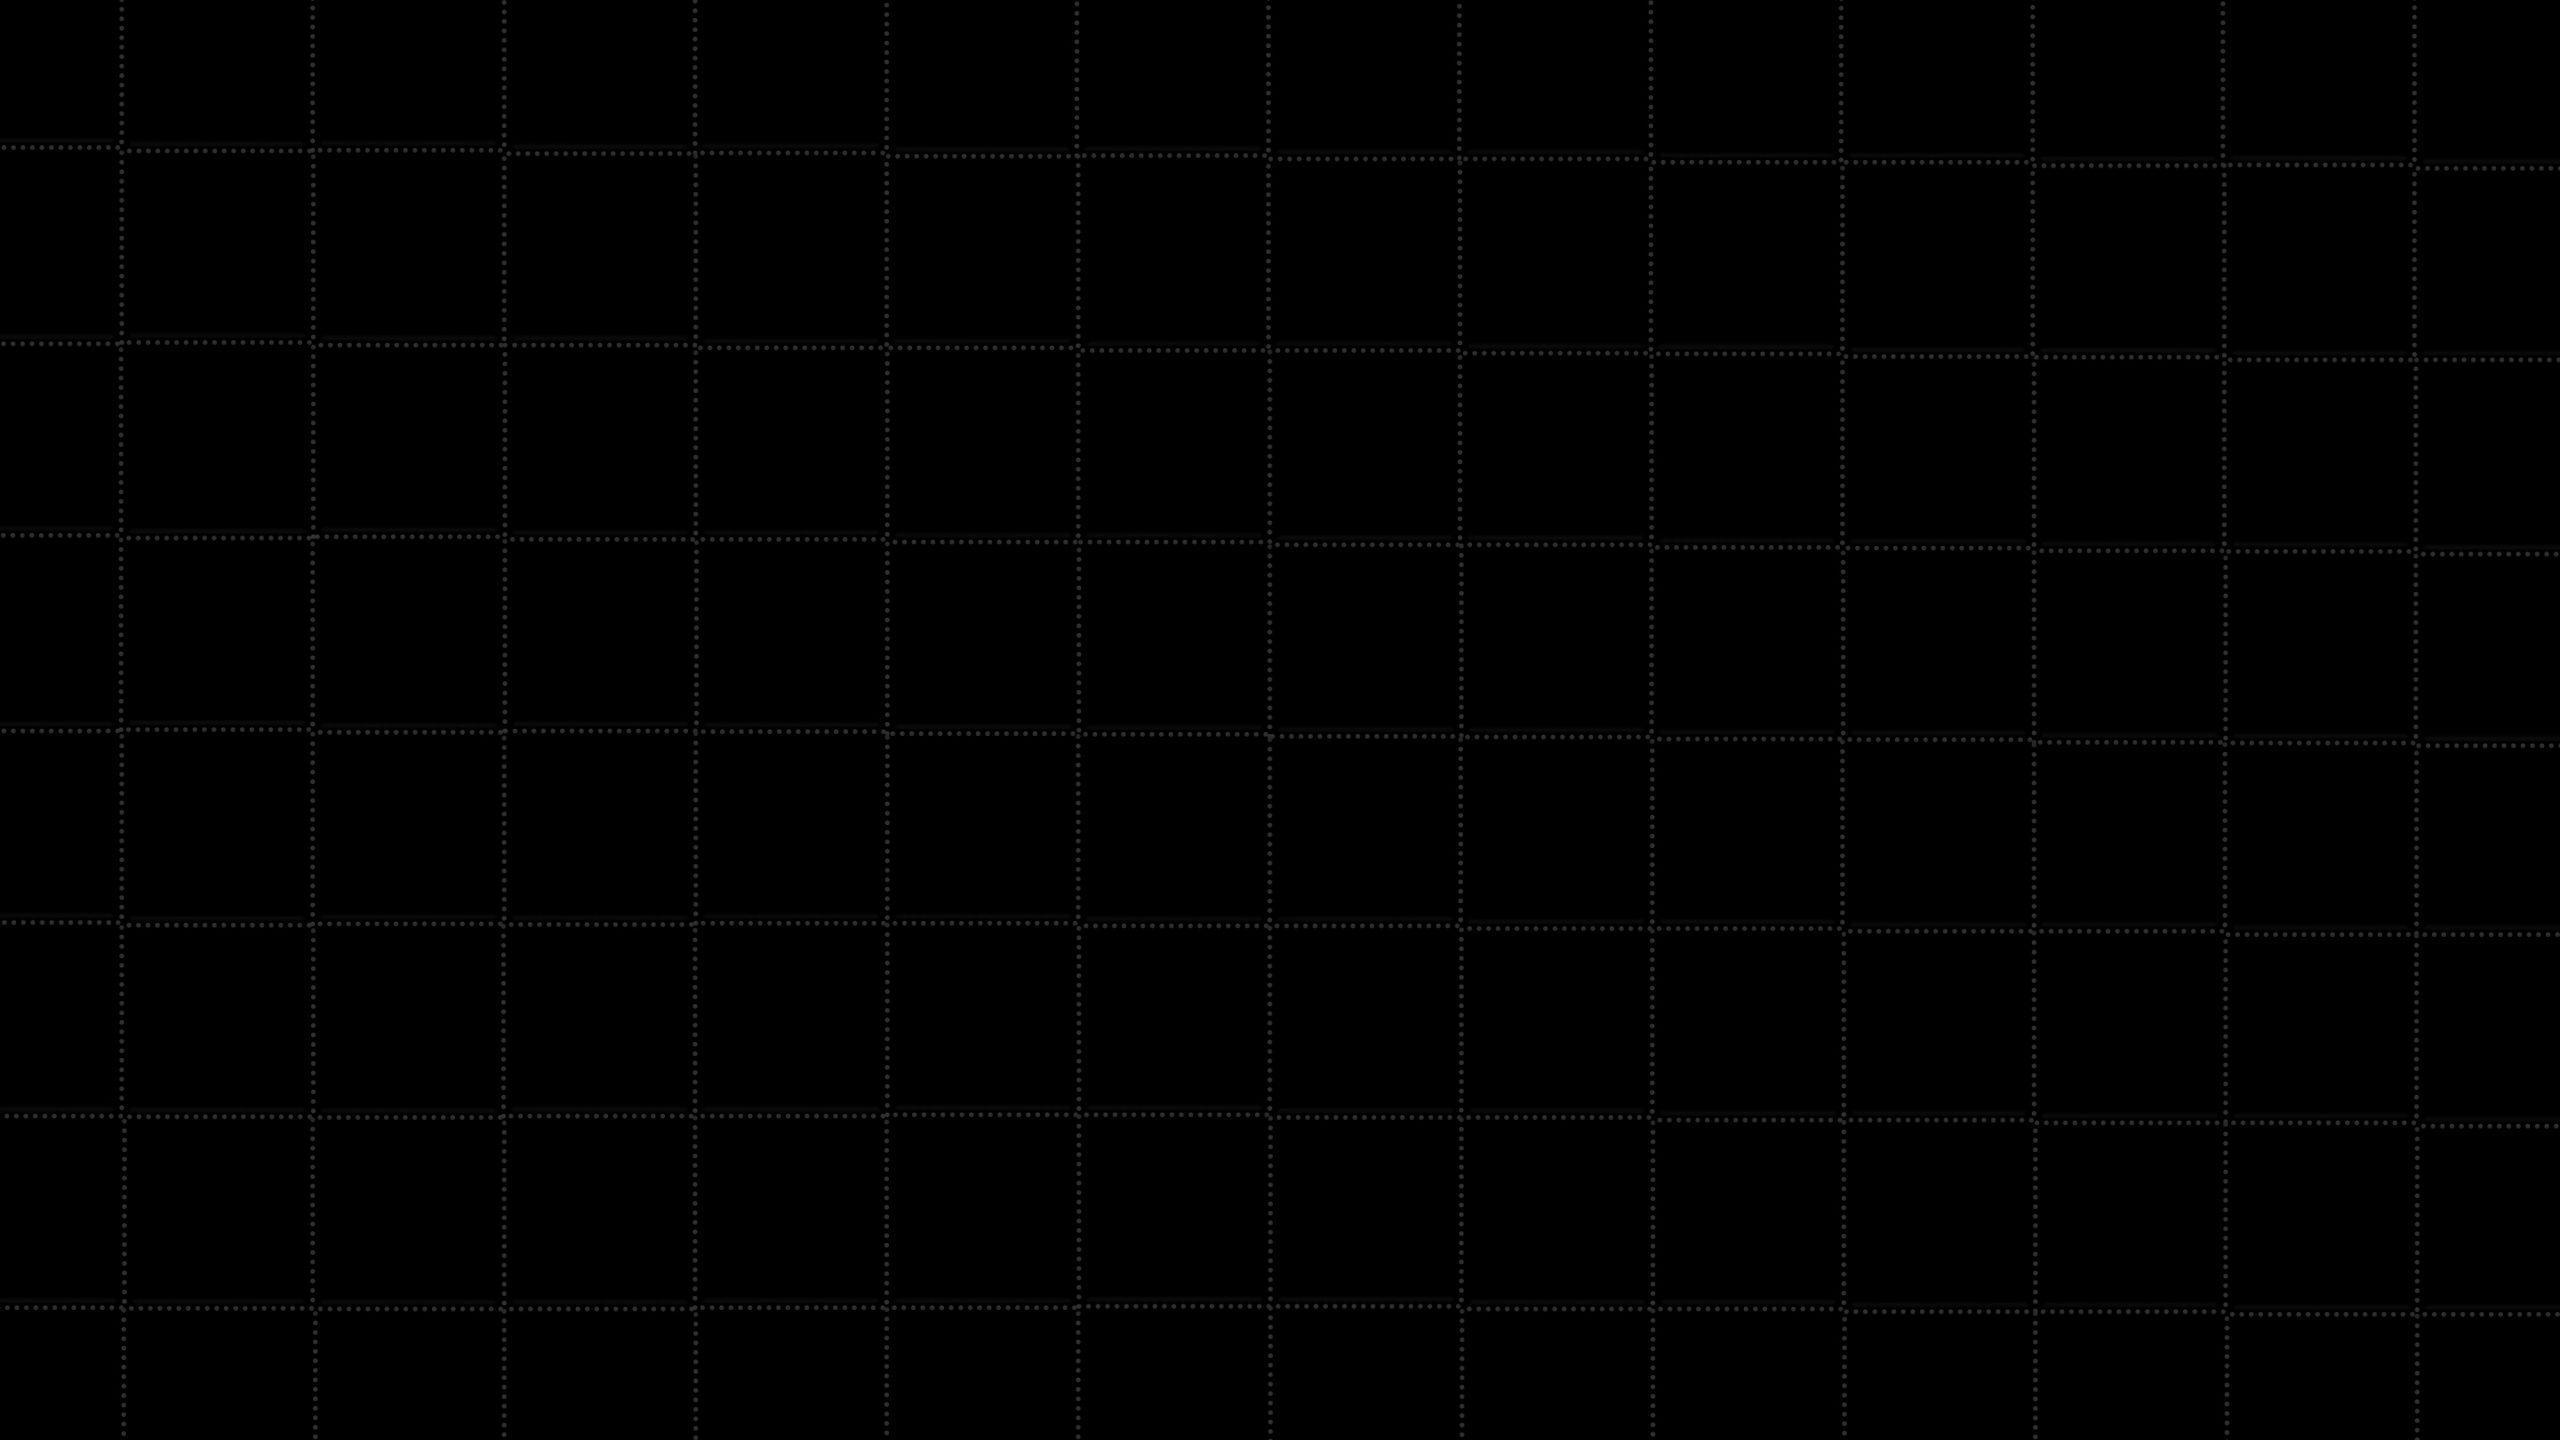 Black grid shaped wallpaper